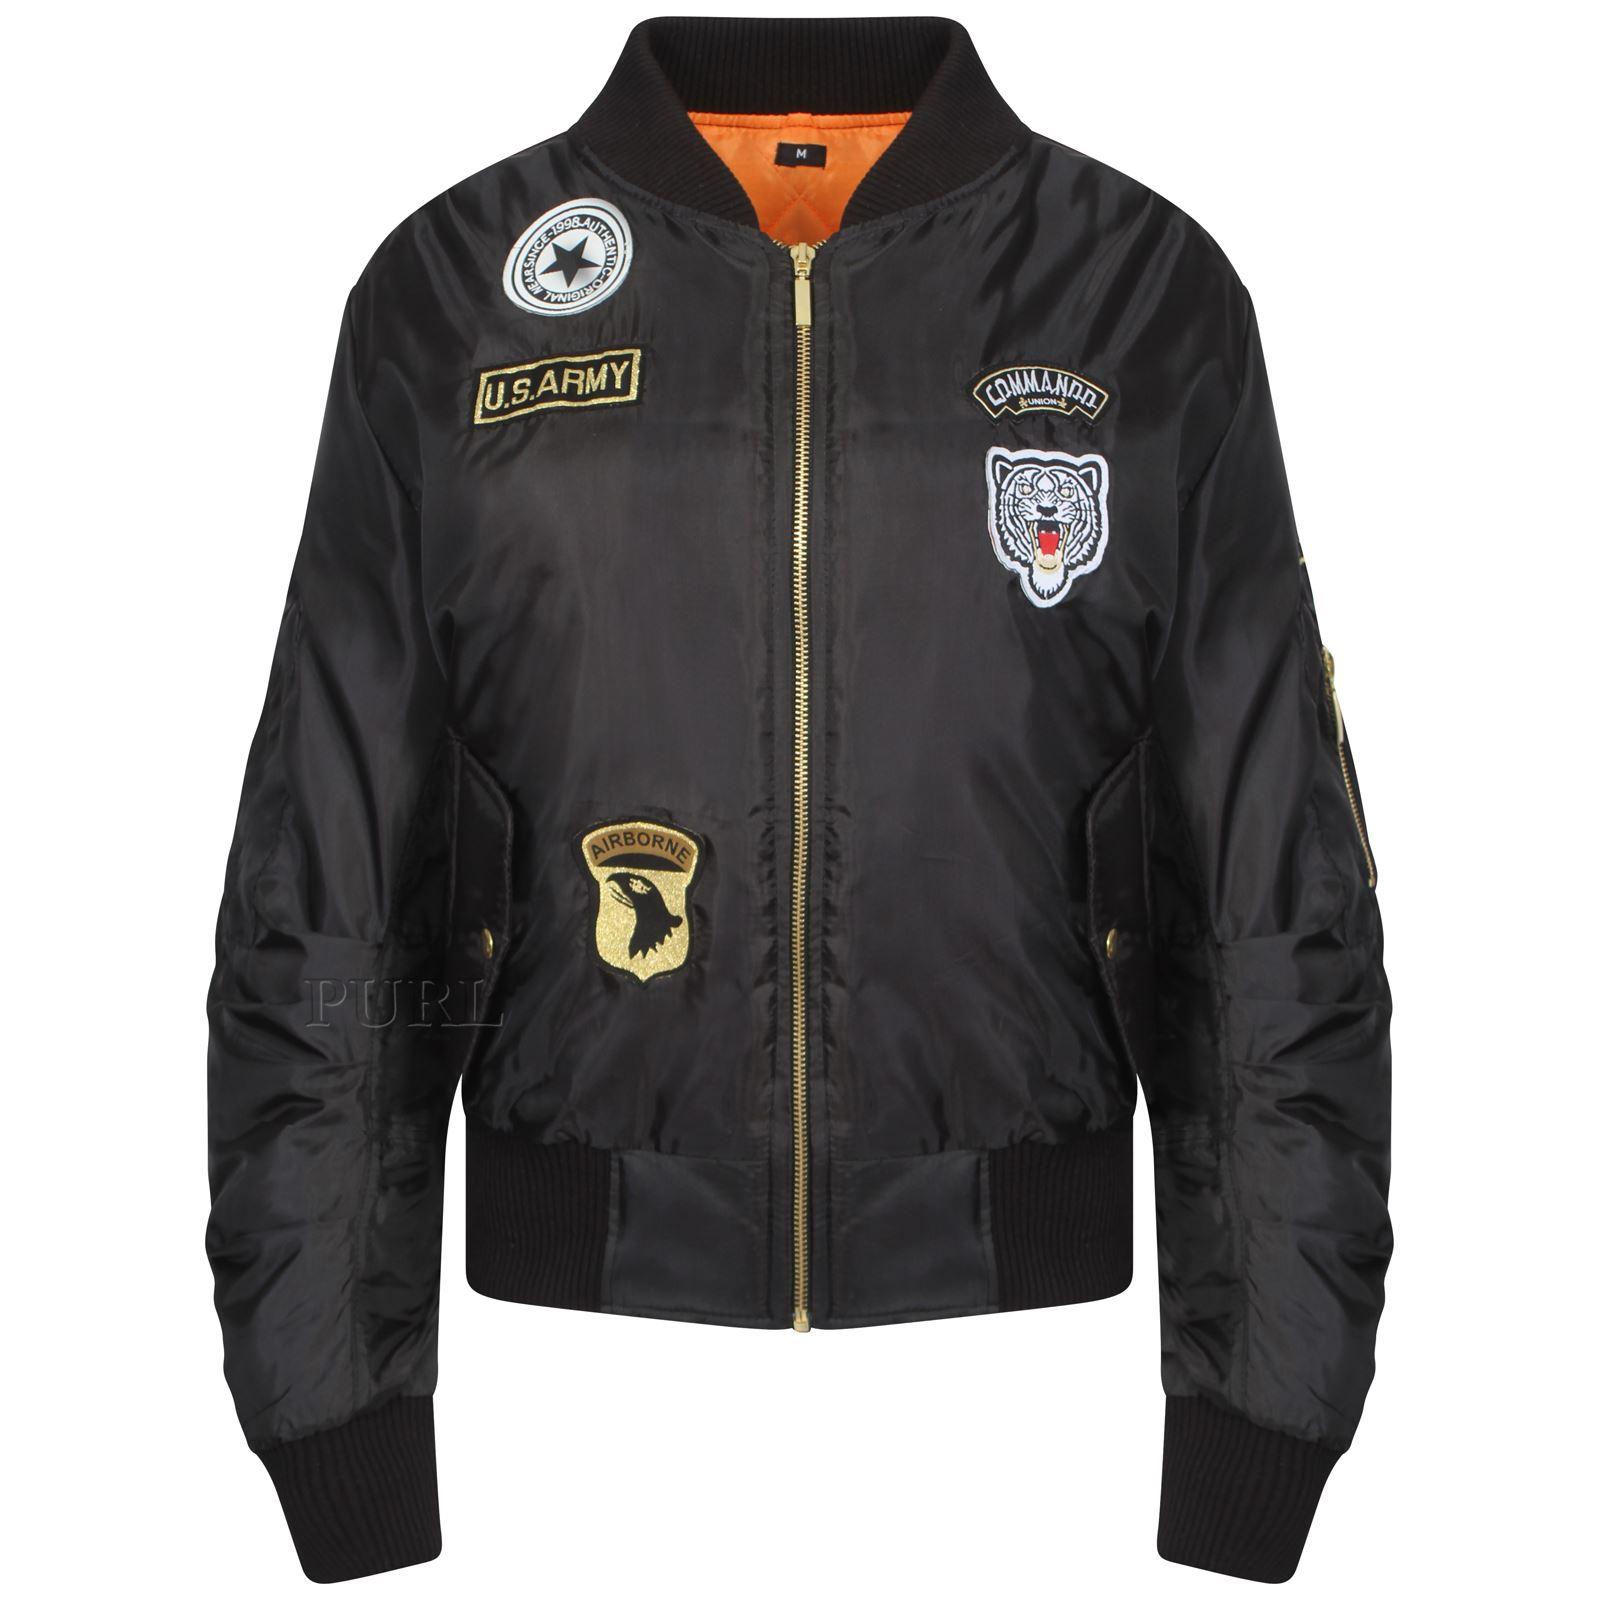 Ladies Womens Vintage Bomber Jacket Plus Size US Army Badges Biker Jacket MA1 | EBay